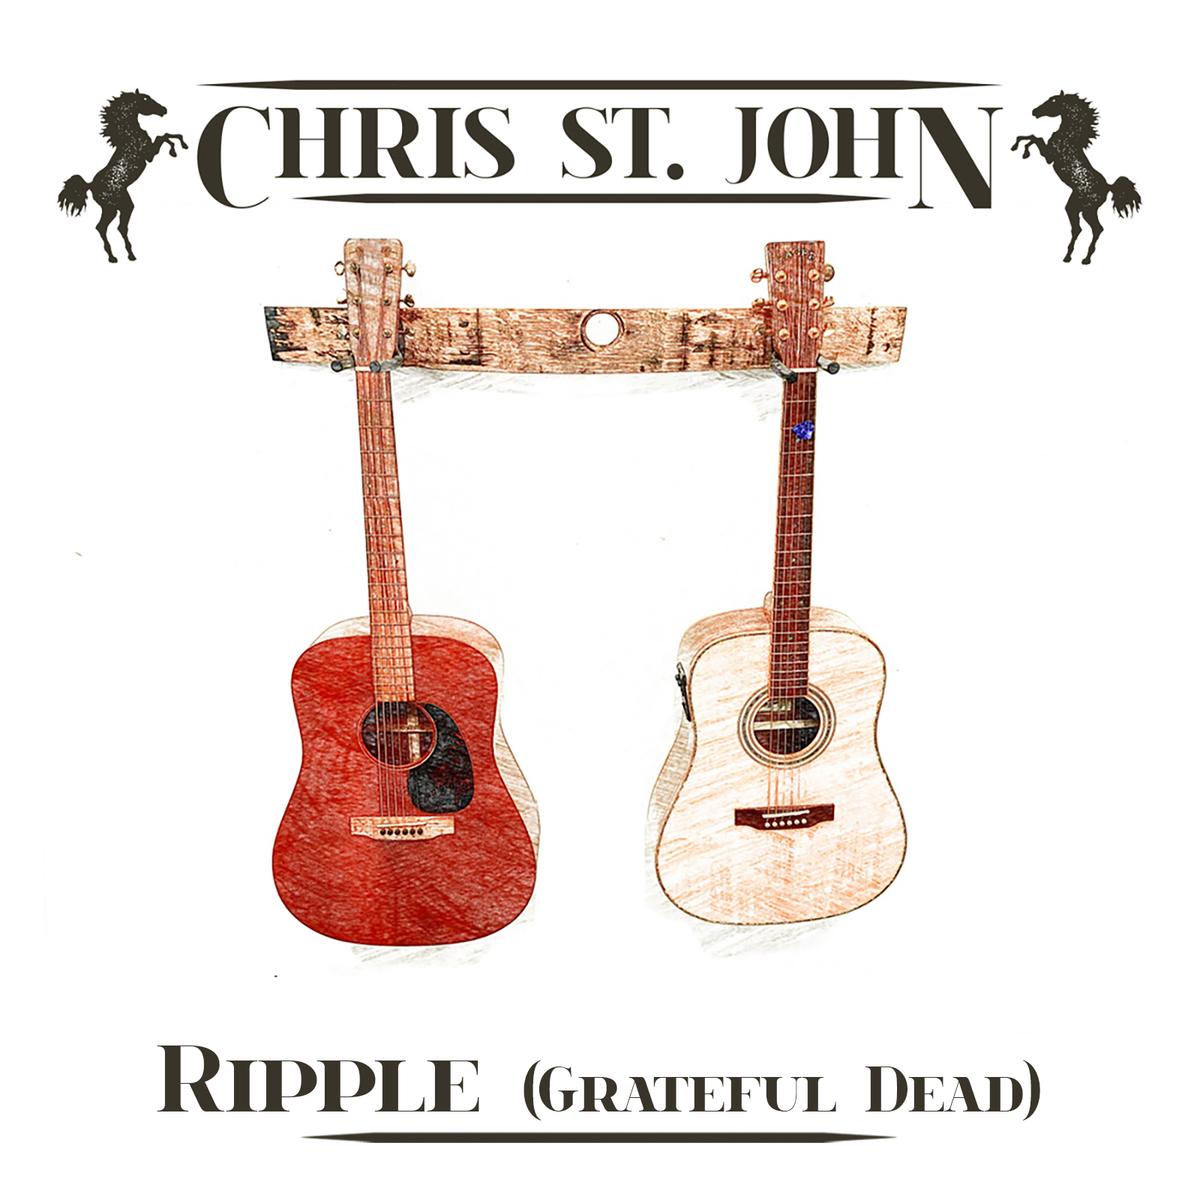 Ripple (Grateful Dead Cover)